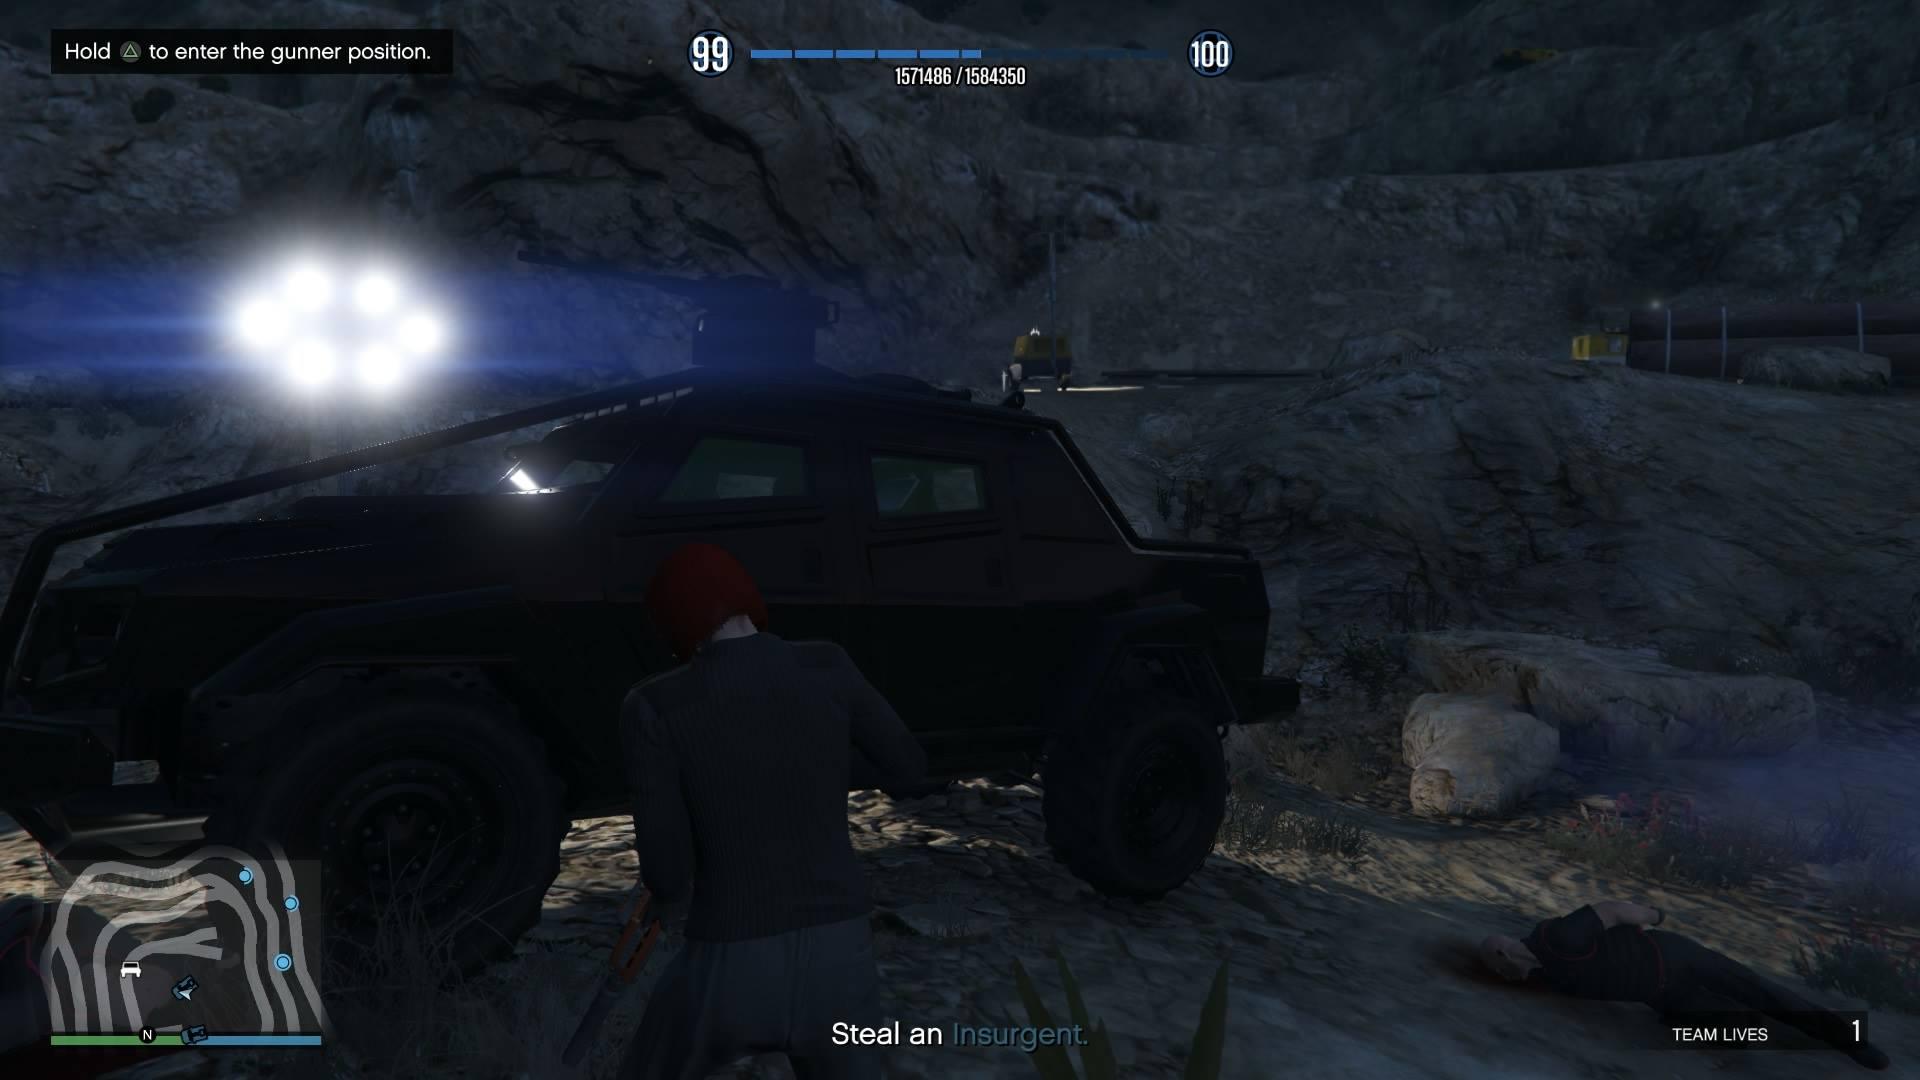 get_insurgent